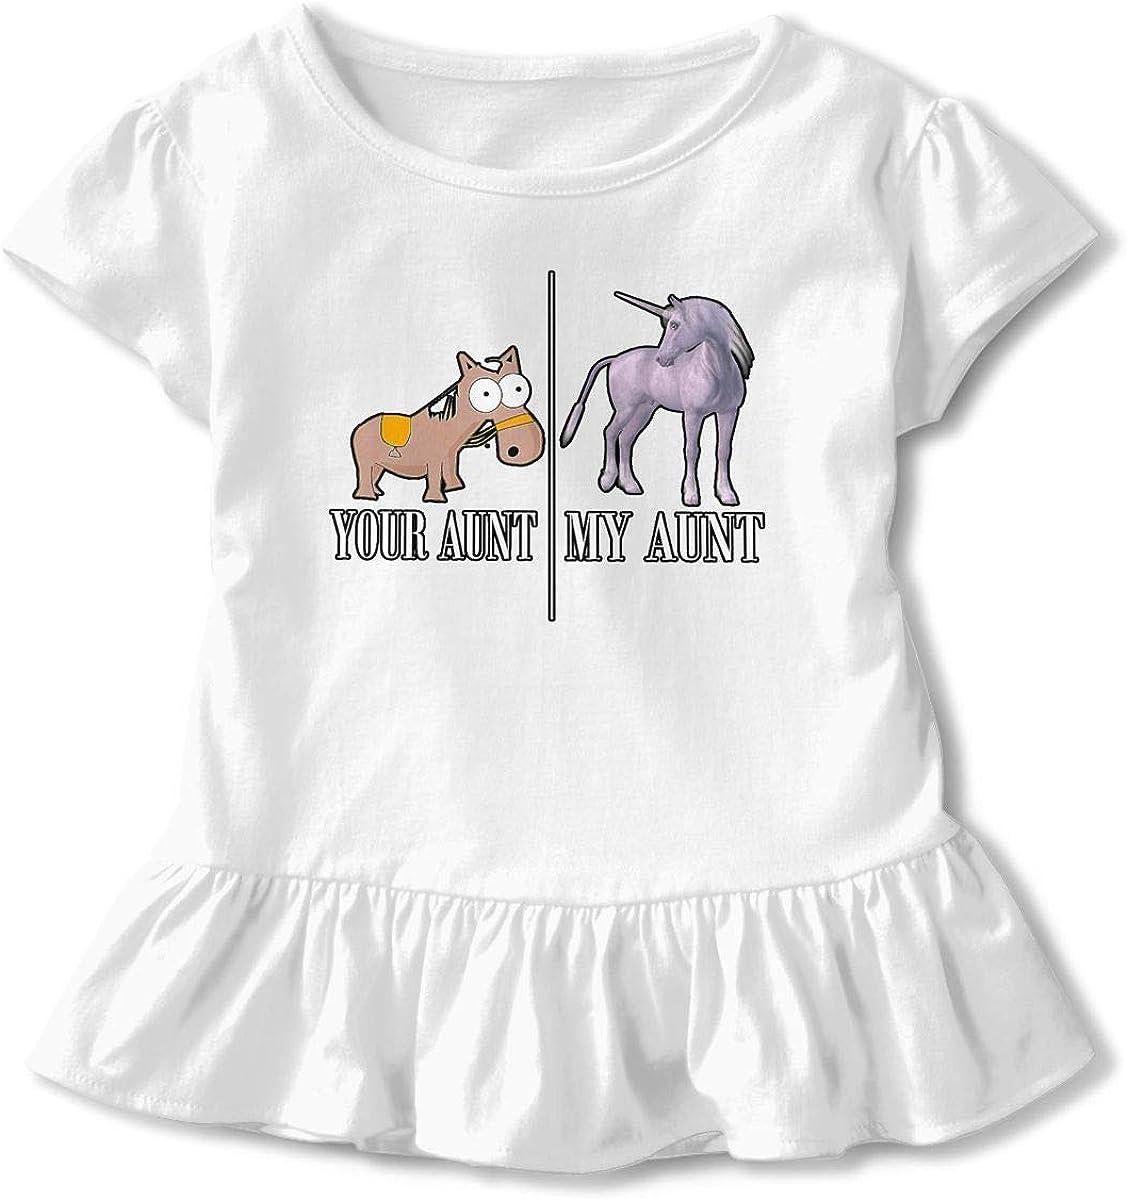 Unicorn Horse Your Aunt My Aunt Toddler Girls T Shirt Kids Cotton Short Sleeve Ruffle Tee